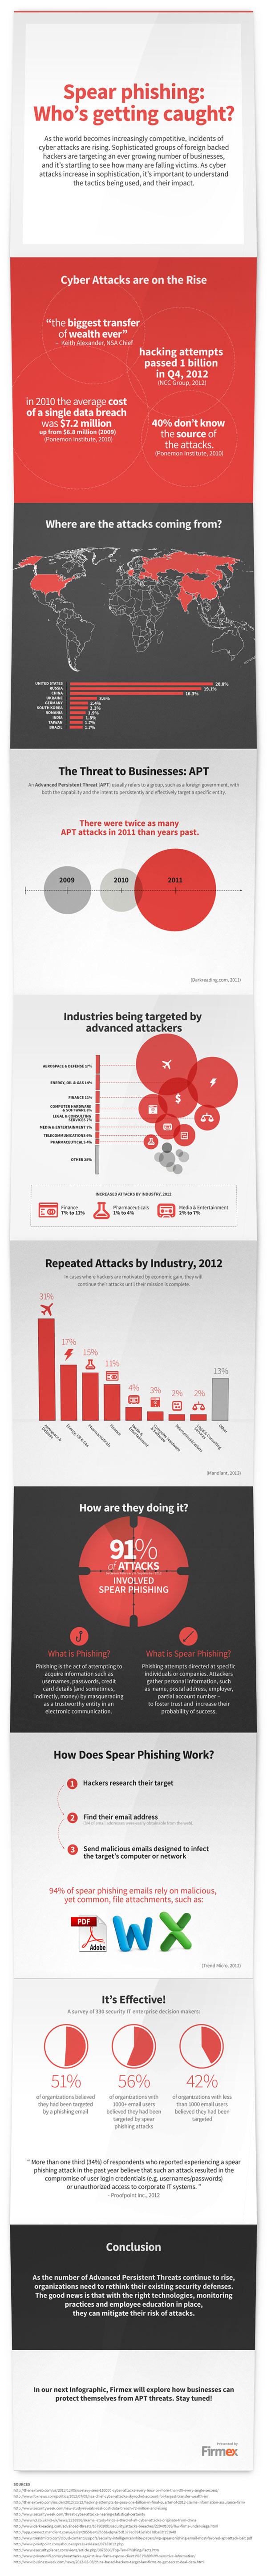 spear-phishing-infographic